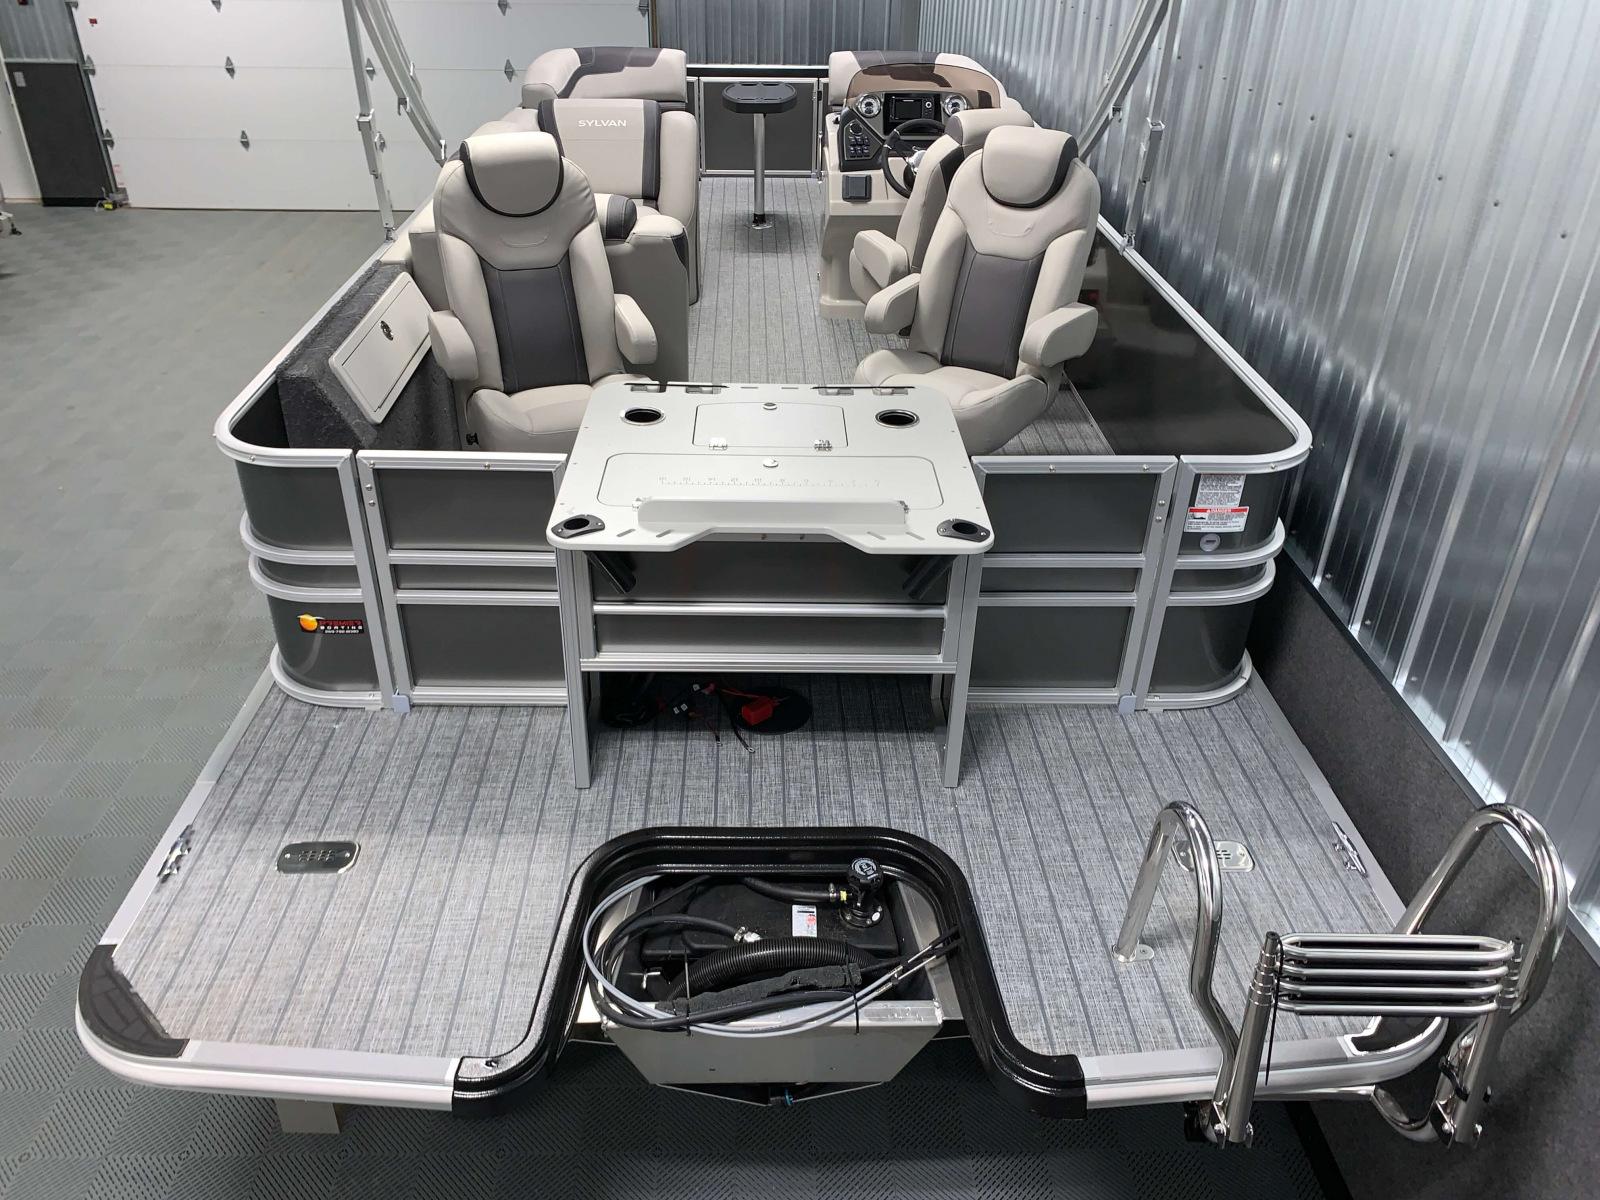 Rear Swim Deck of the 2022 Sylvan L3 Party Fish Pontoon Boat